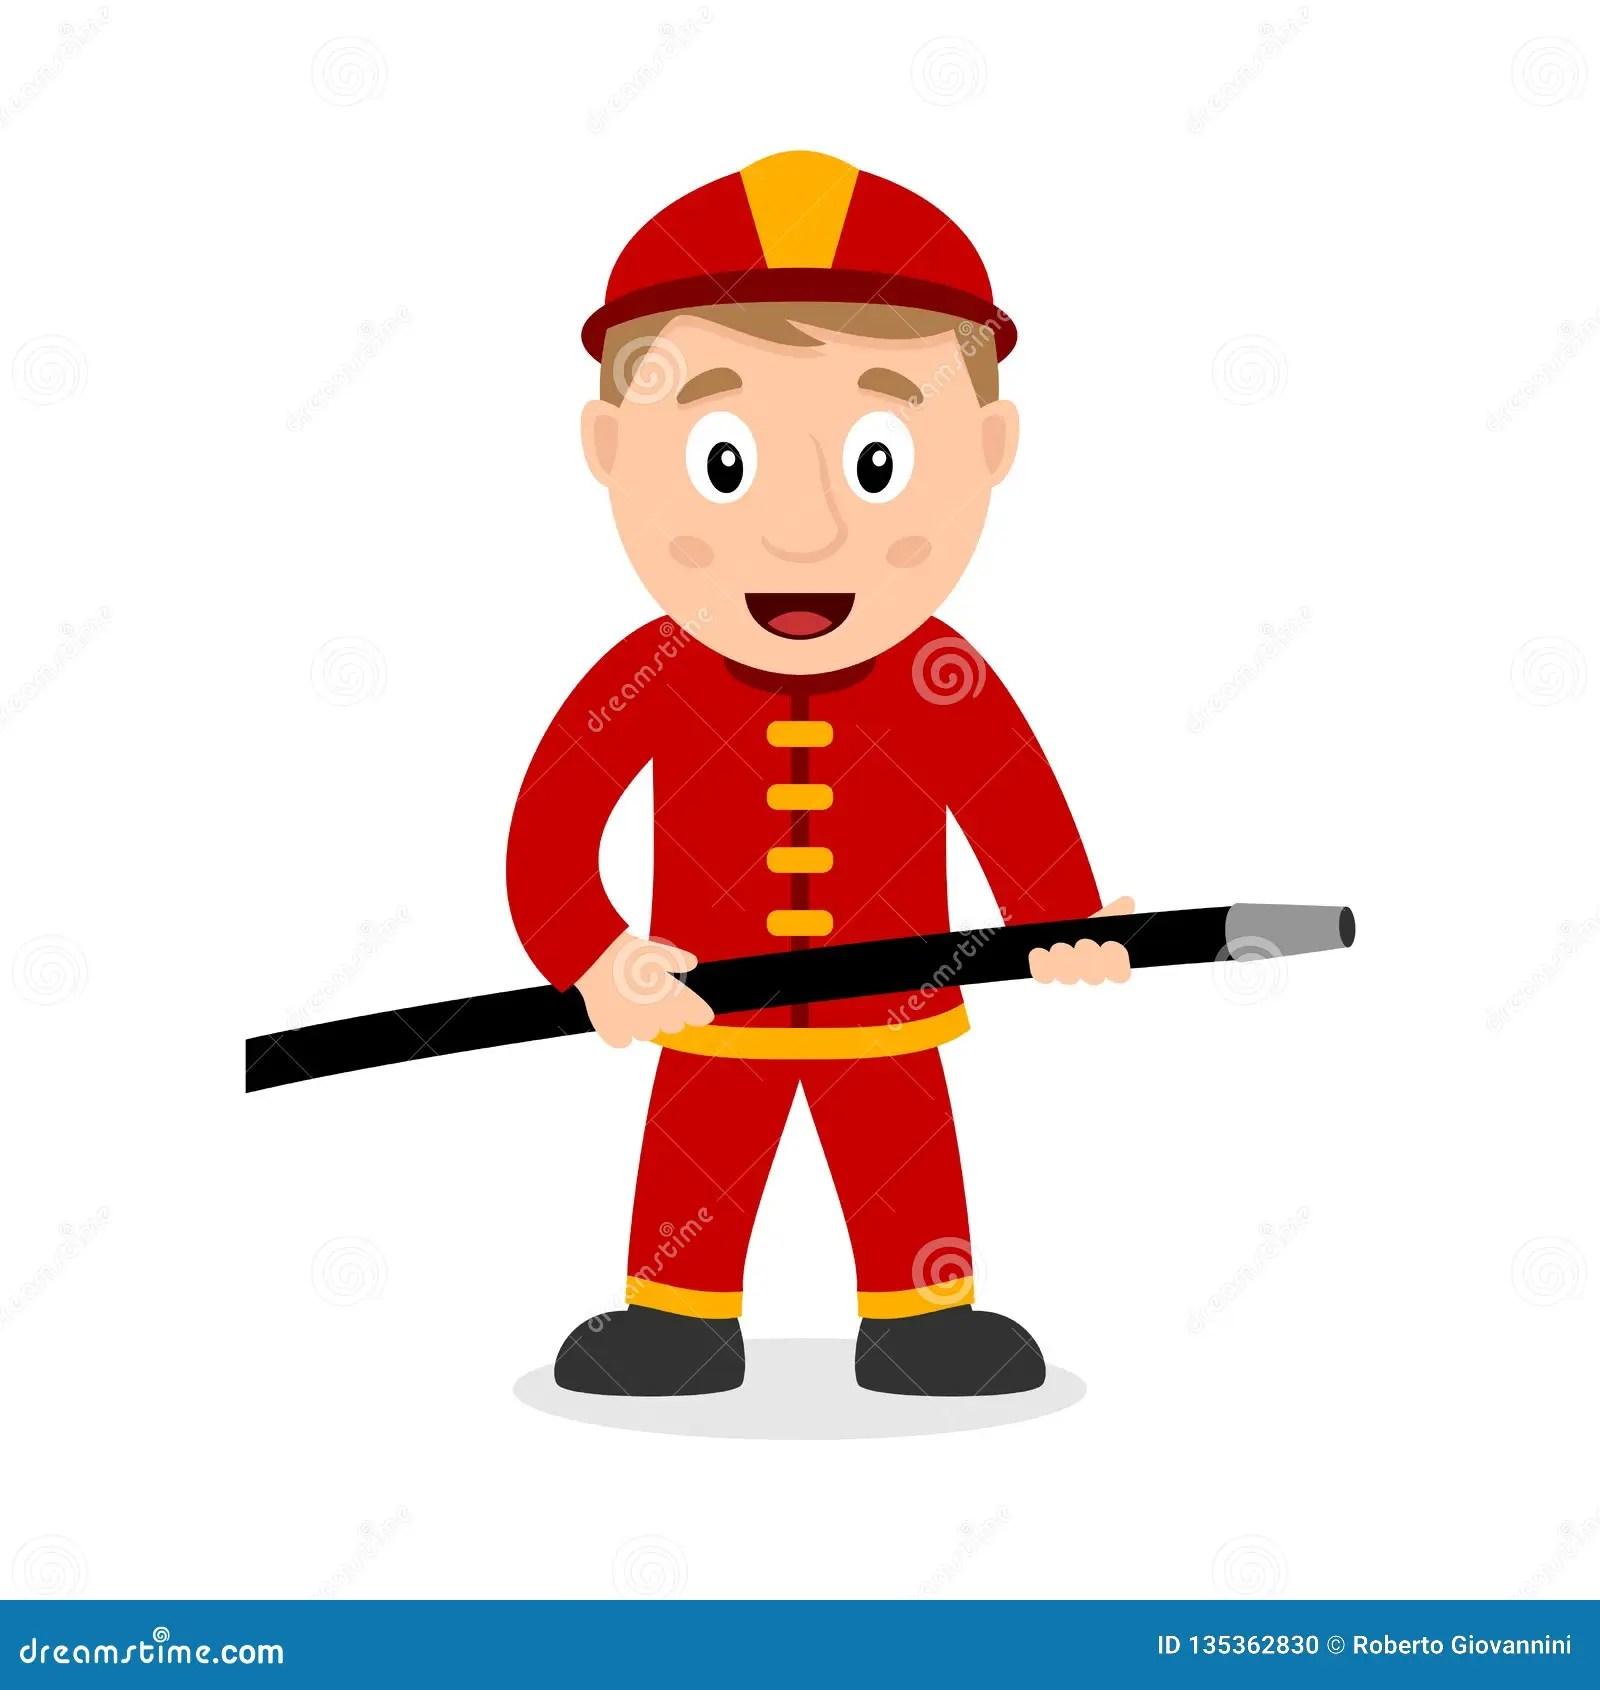 fireman cartoon character with